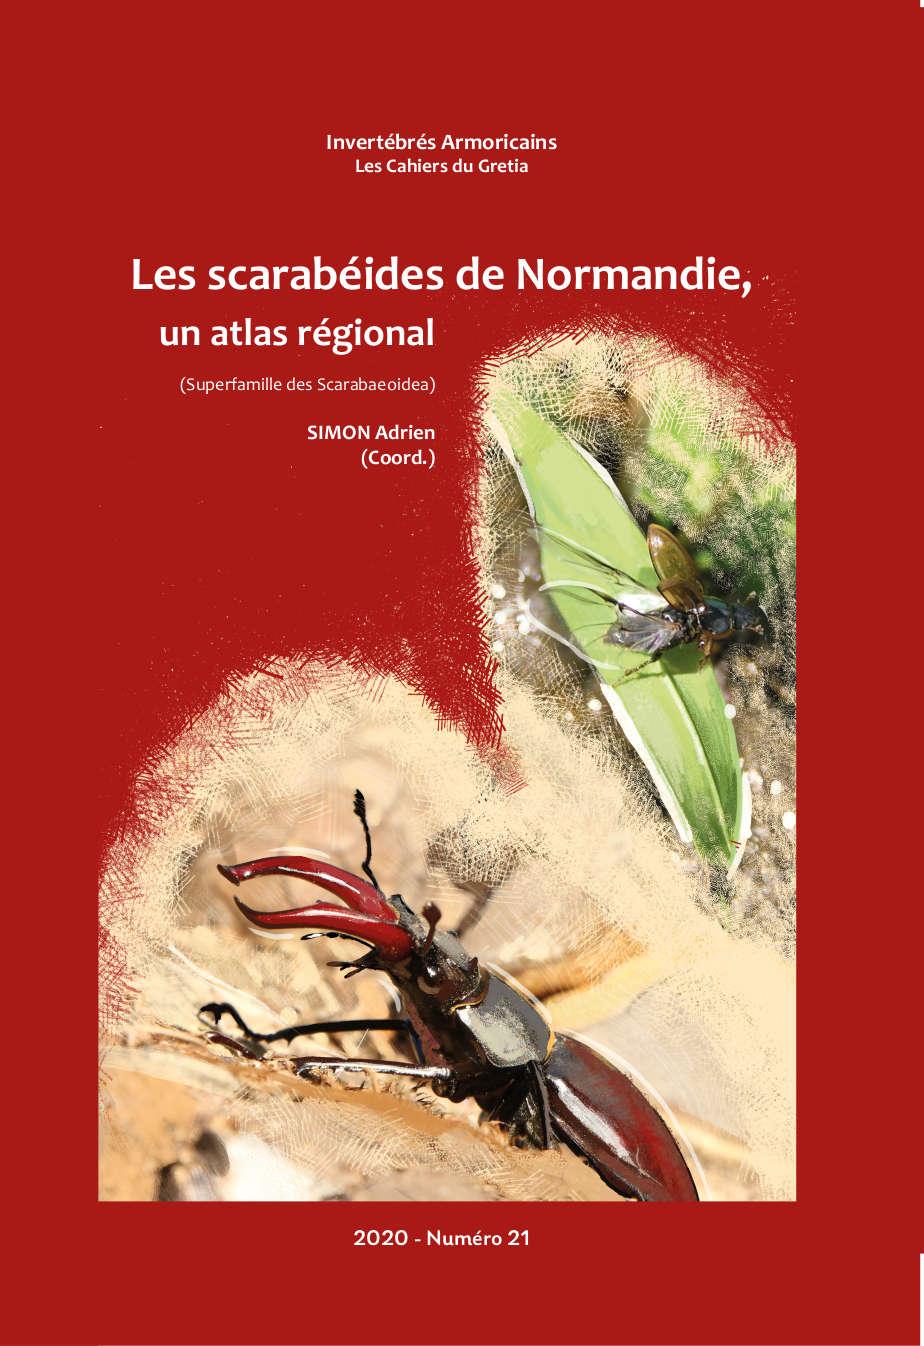 L Atlas Des Scarabeides De Normandie Est Disponible Asehn